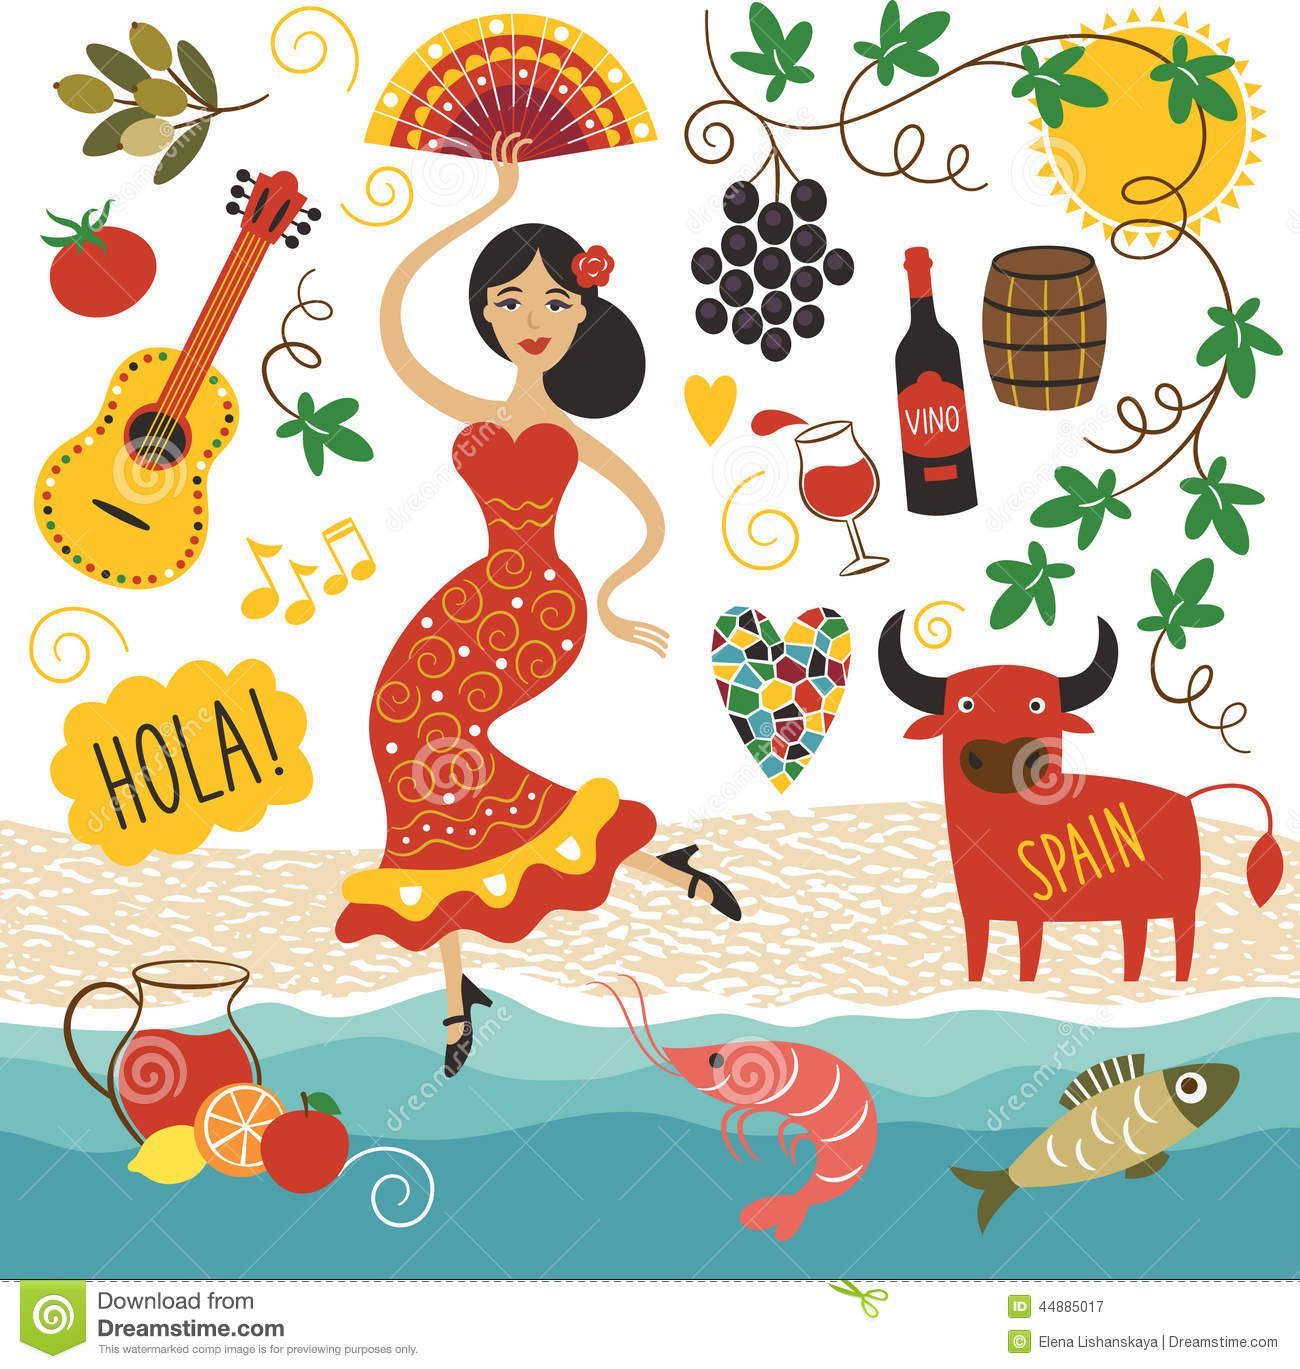 Topicos Spain Landmarks Symbols Set 44885017 Jpg 1 300 1 369 Pixels Cultura Espanhola Espanhol Ilustracoes